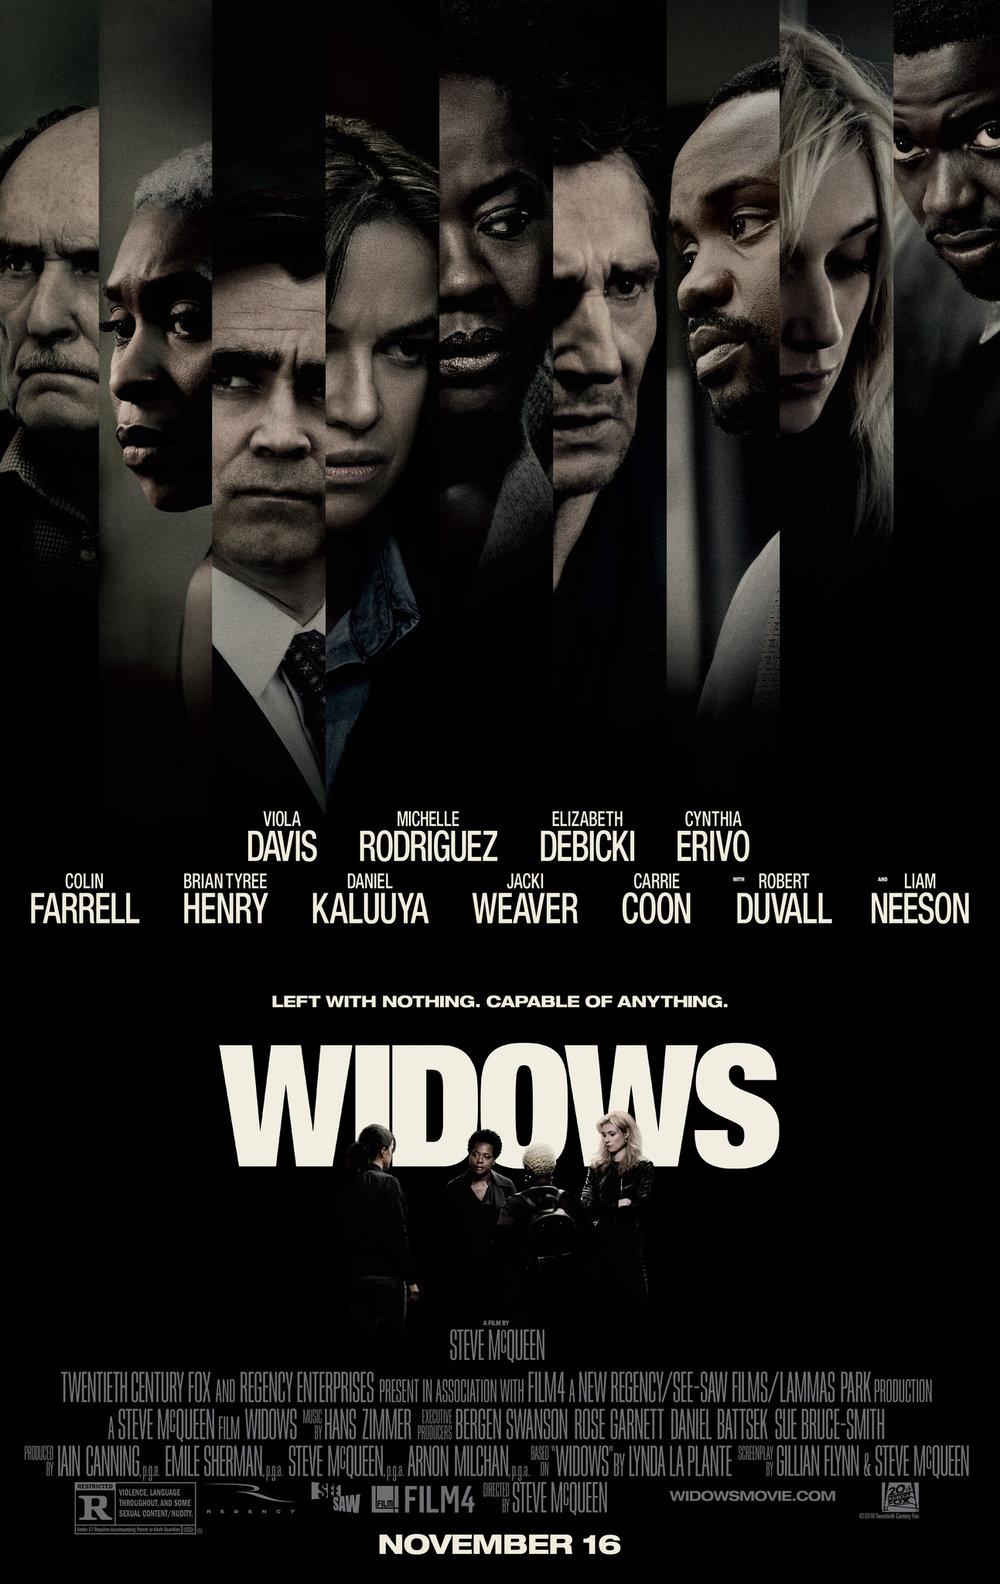 Widows   (2018) dir. Steve McQueen Rated: R image: ©2018  20th Century Fox